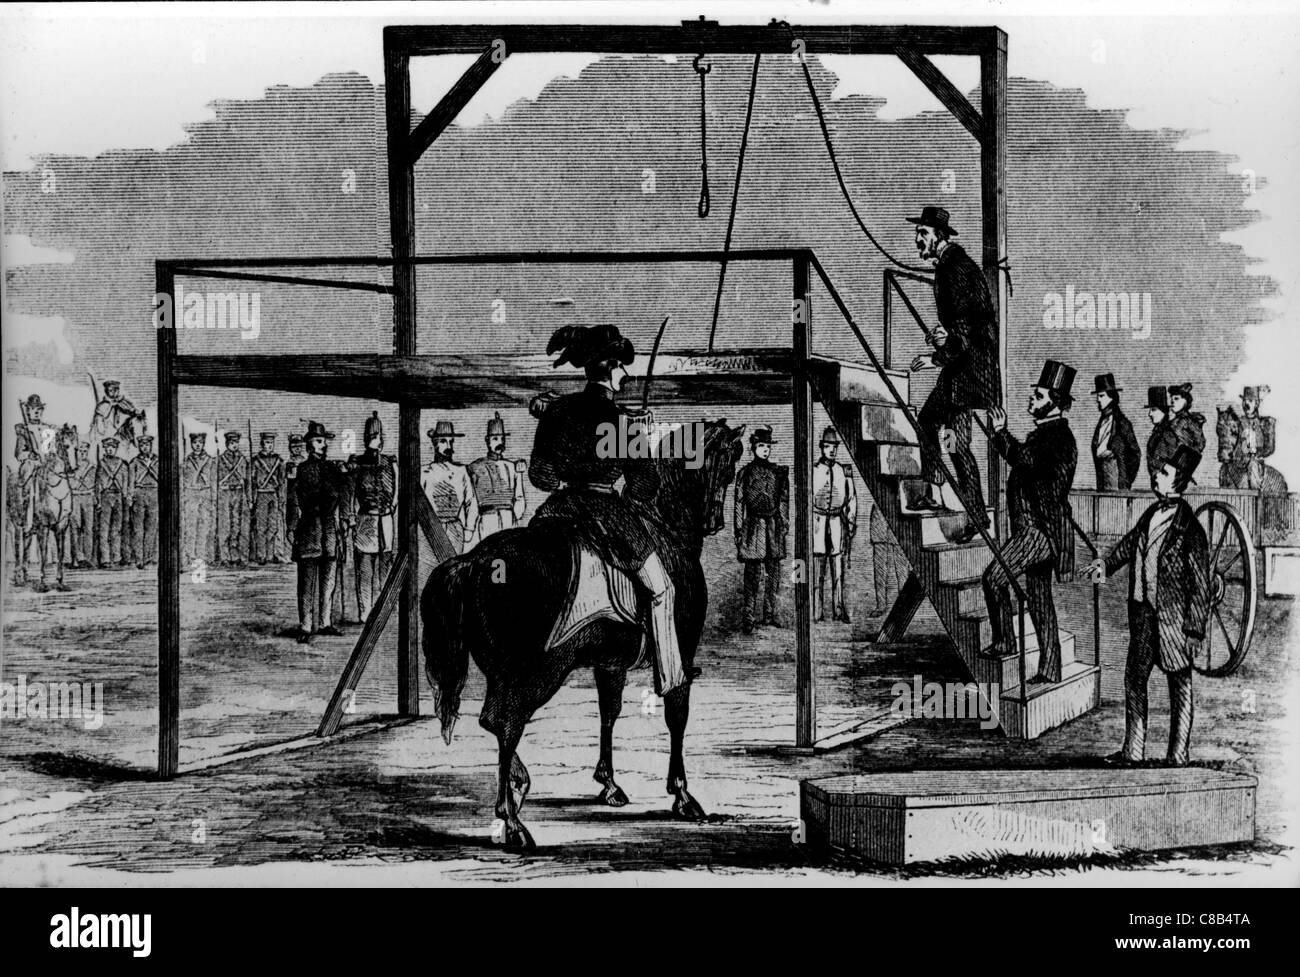 Printing of the hanging of John Brown,1859 - Stock Image